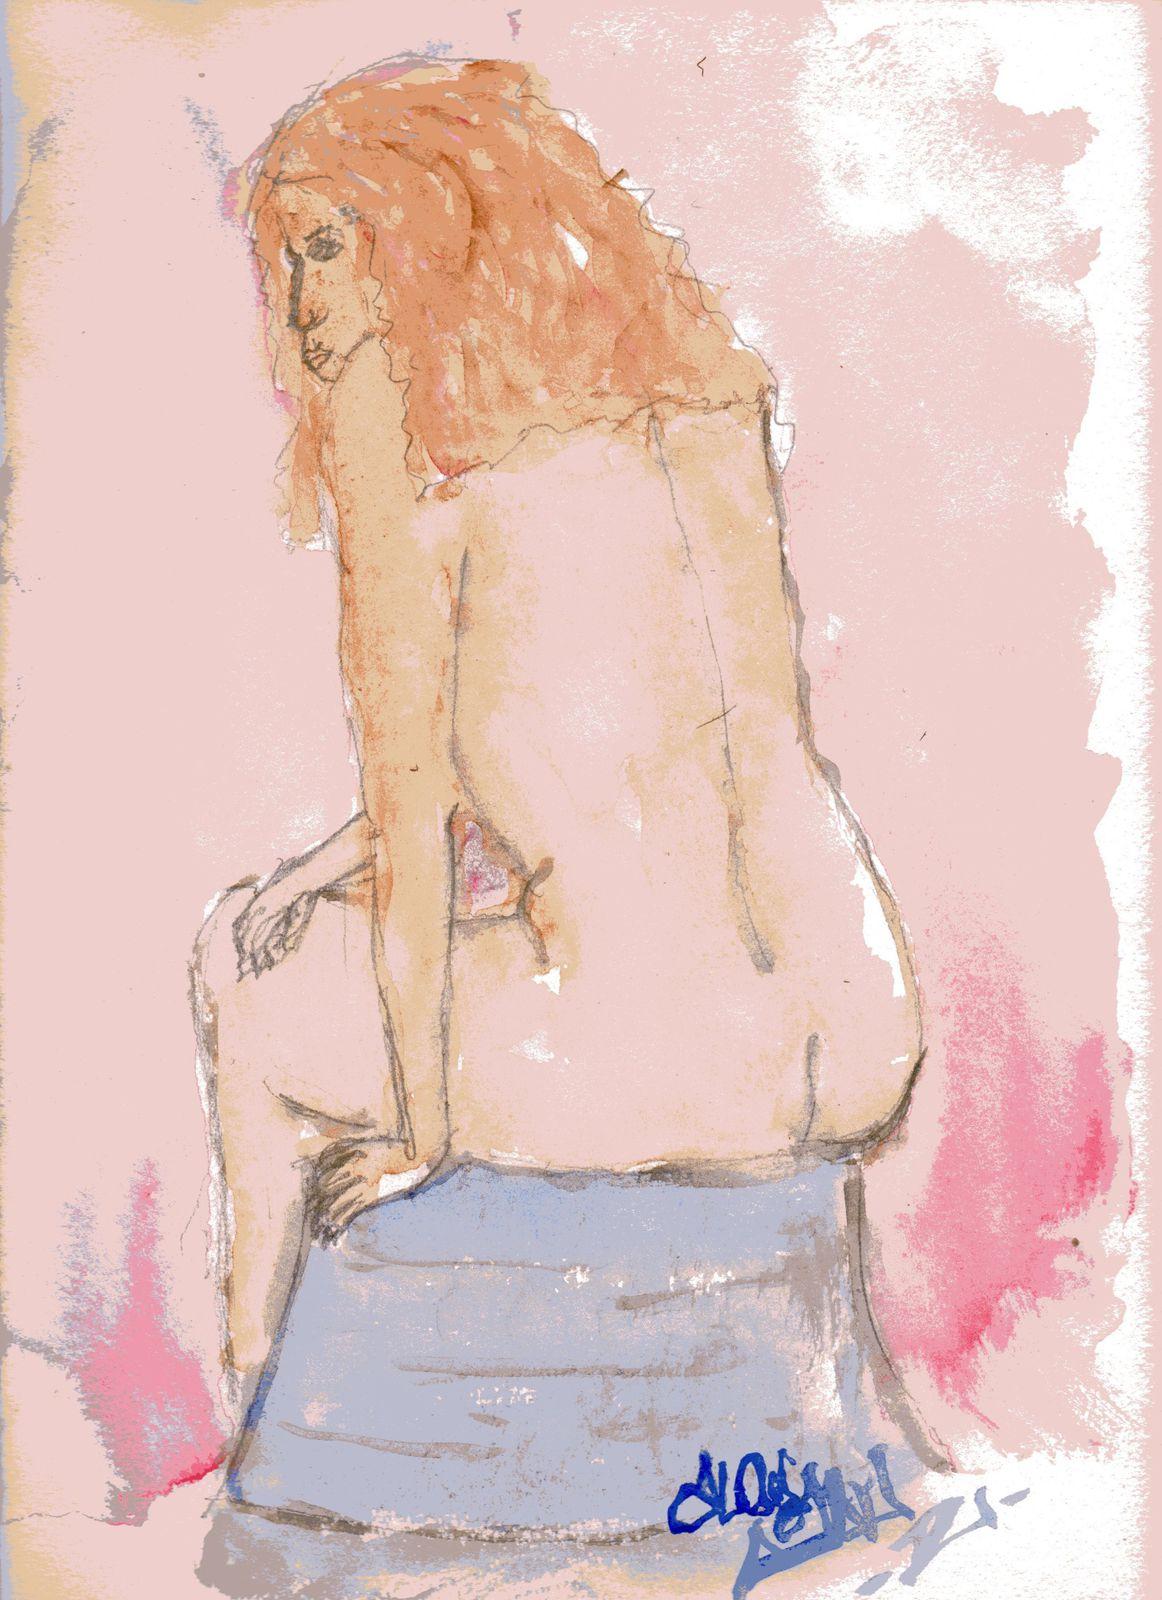 aquarelle nu féminin assis de dos